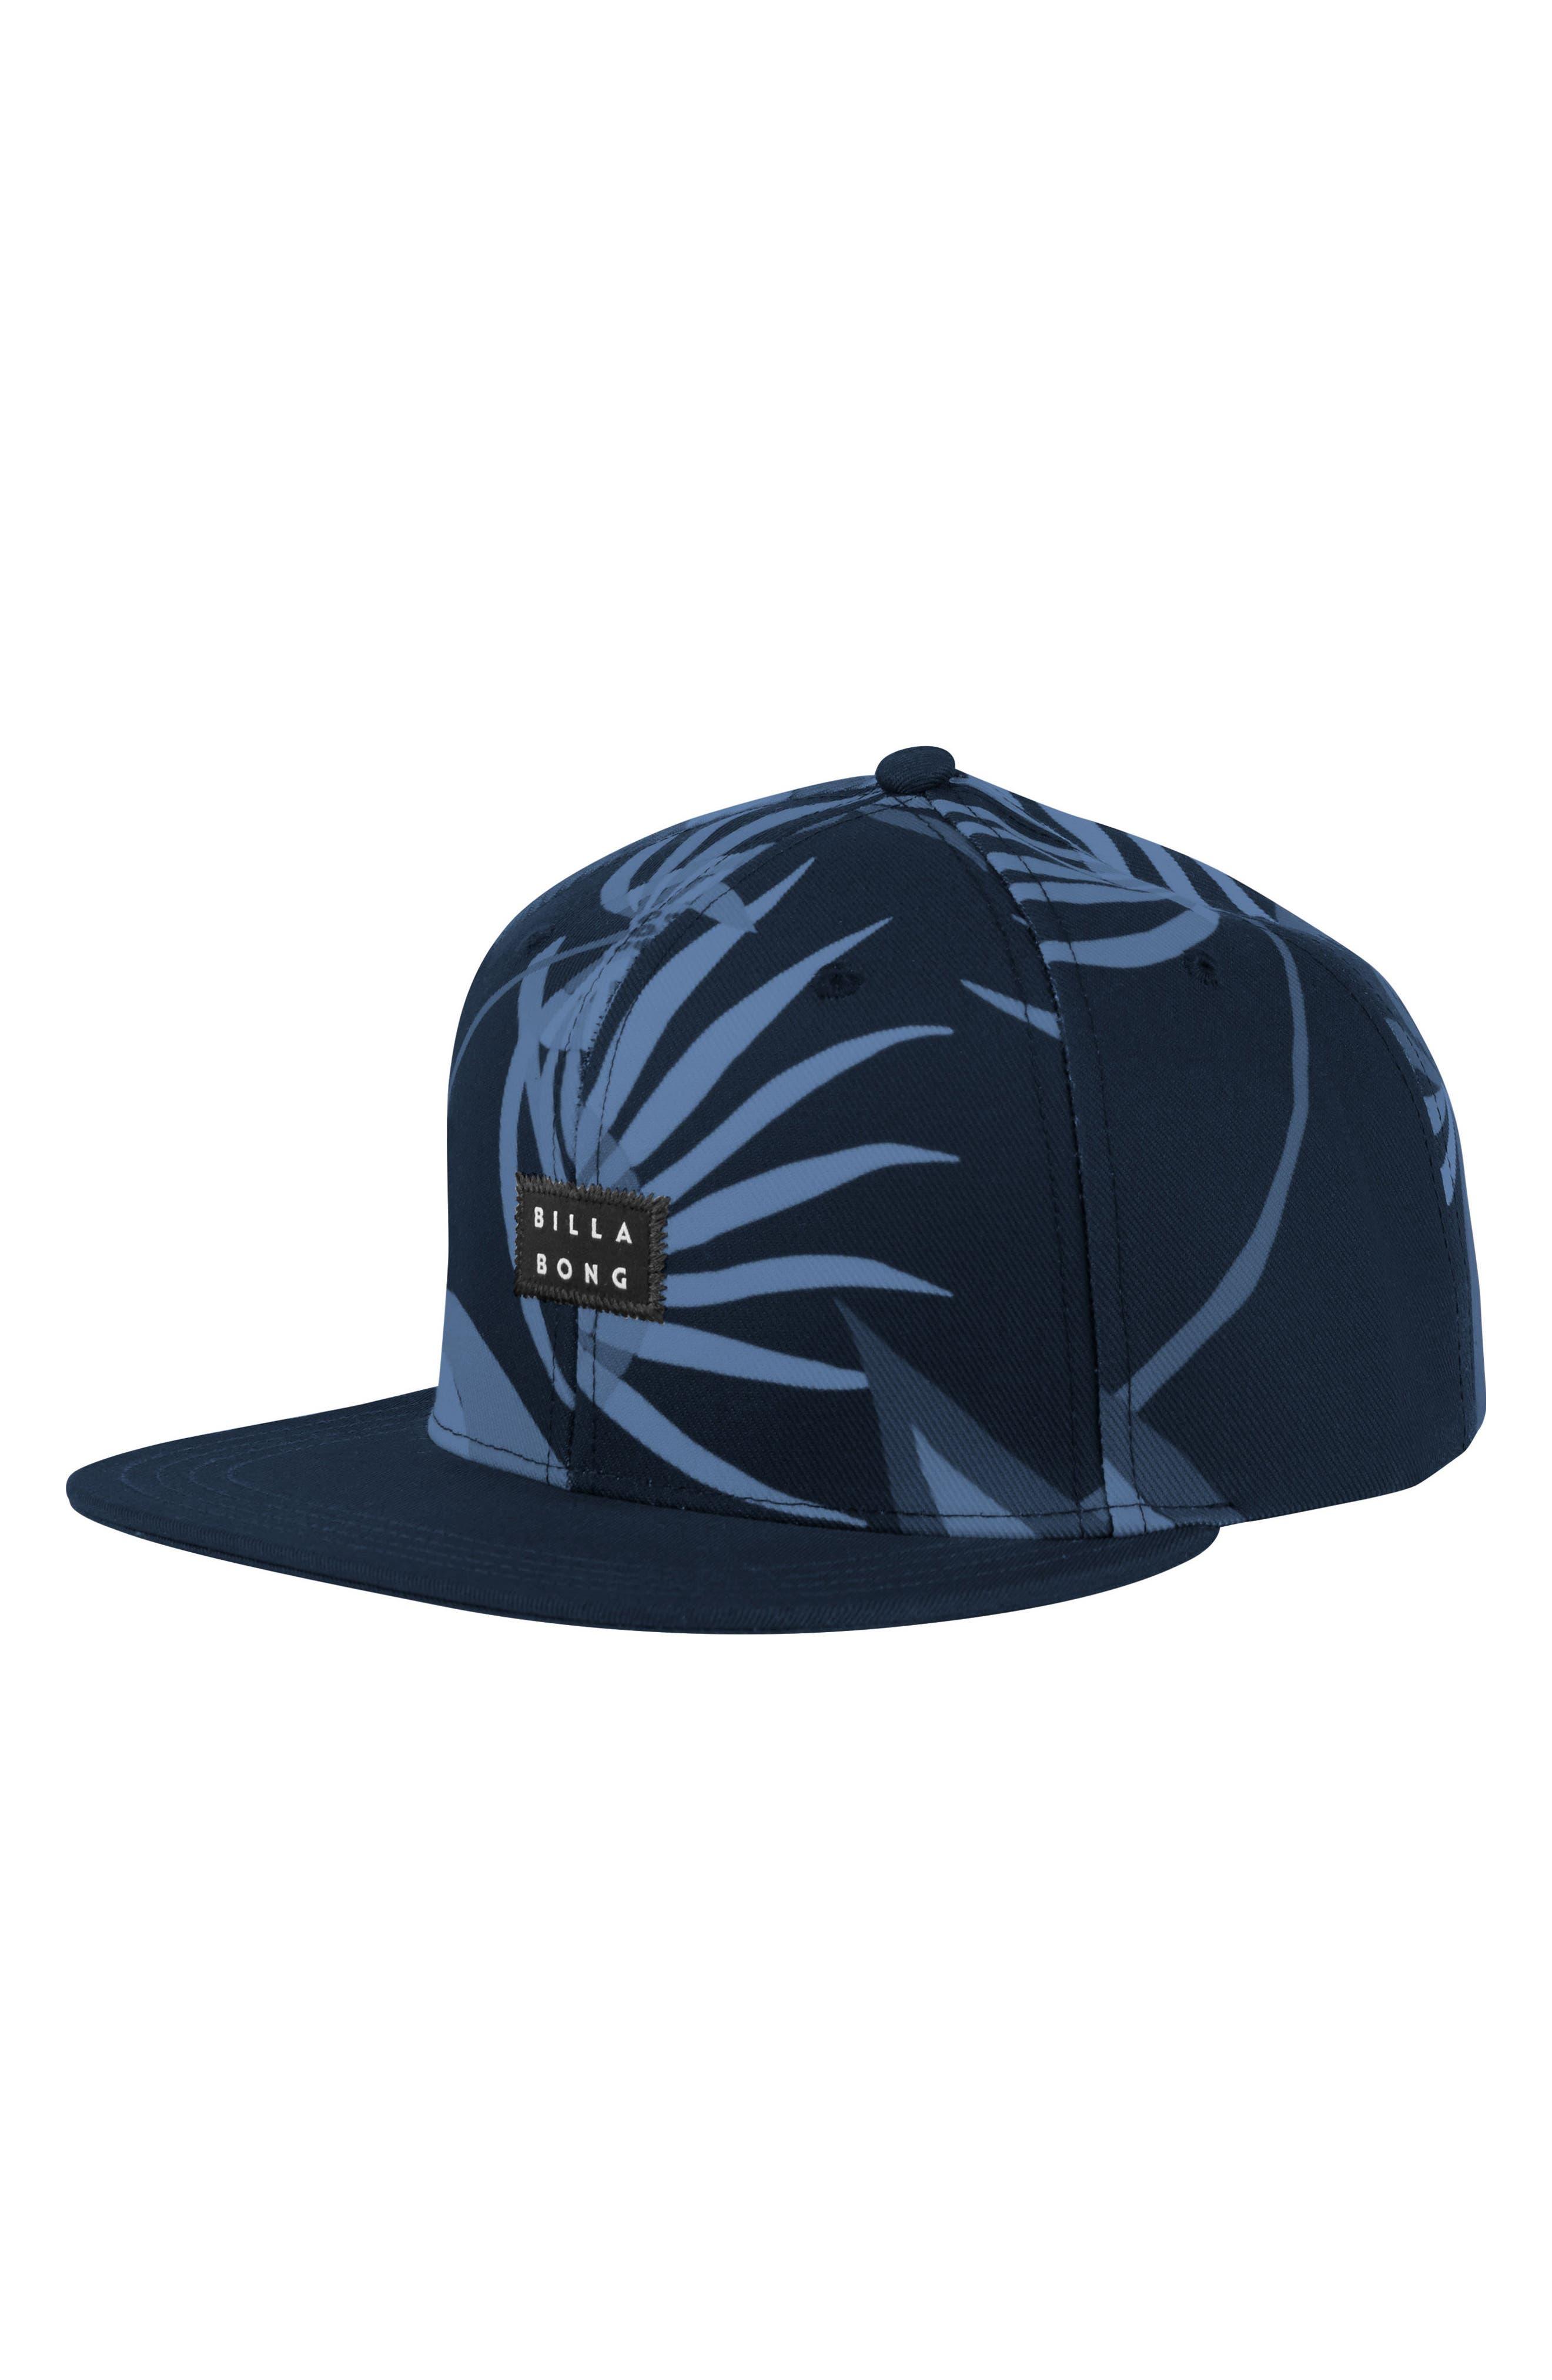 Alternate Image 1 Selected - Billabong Sundays Snapback Hat